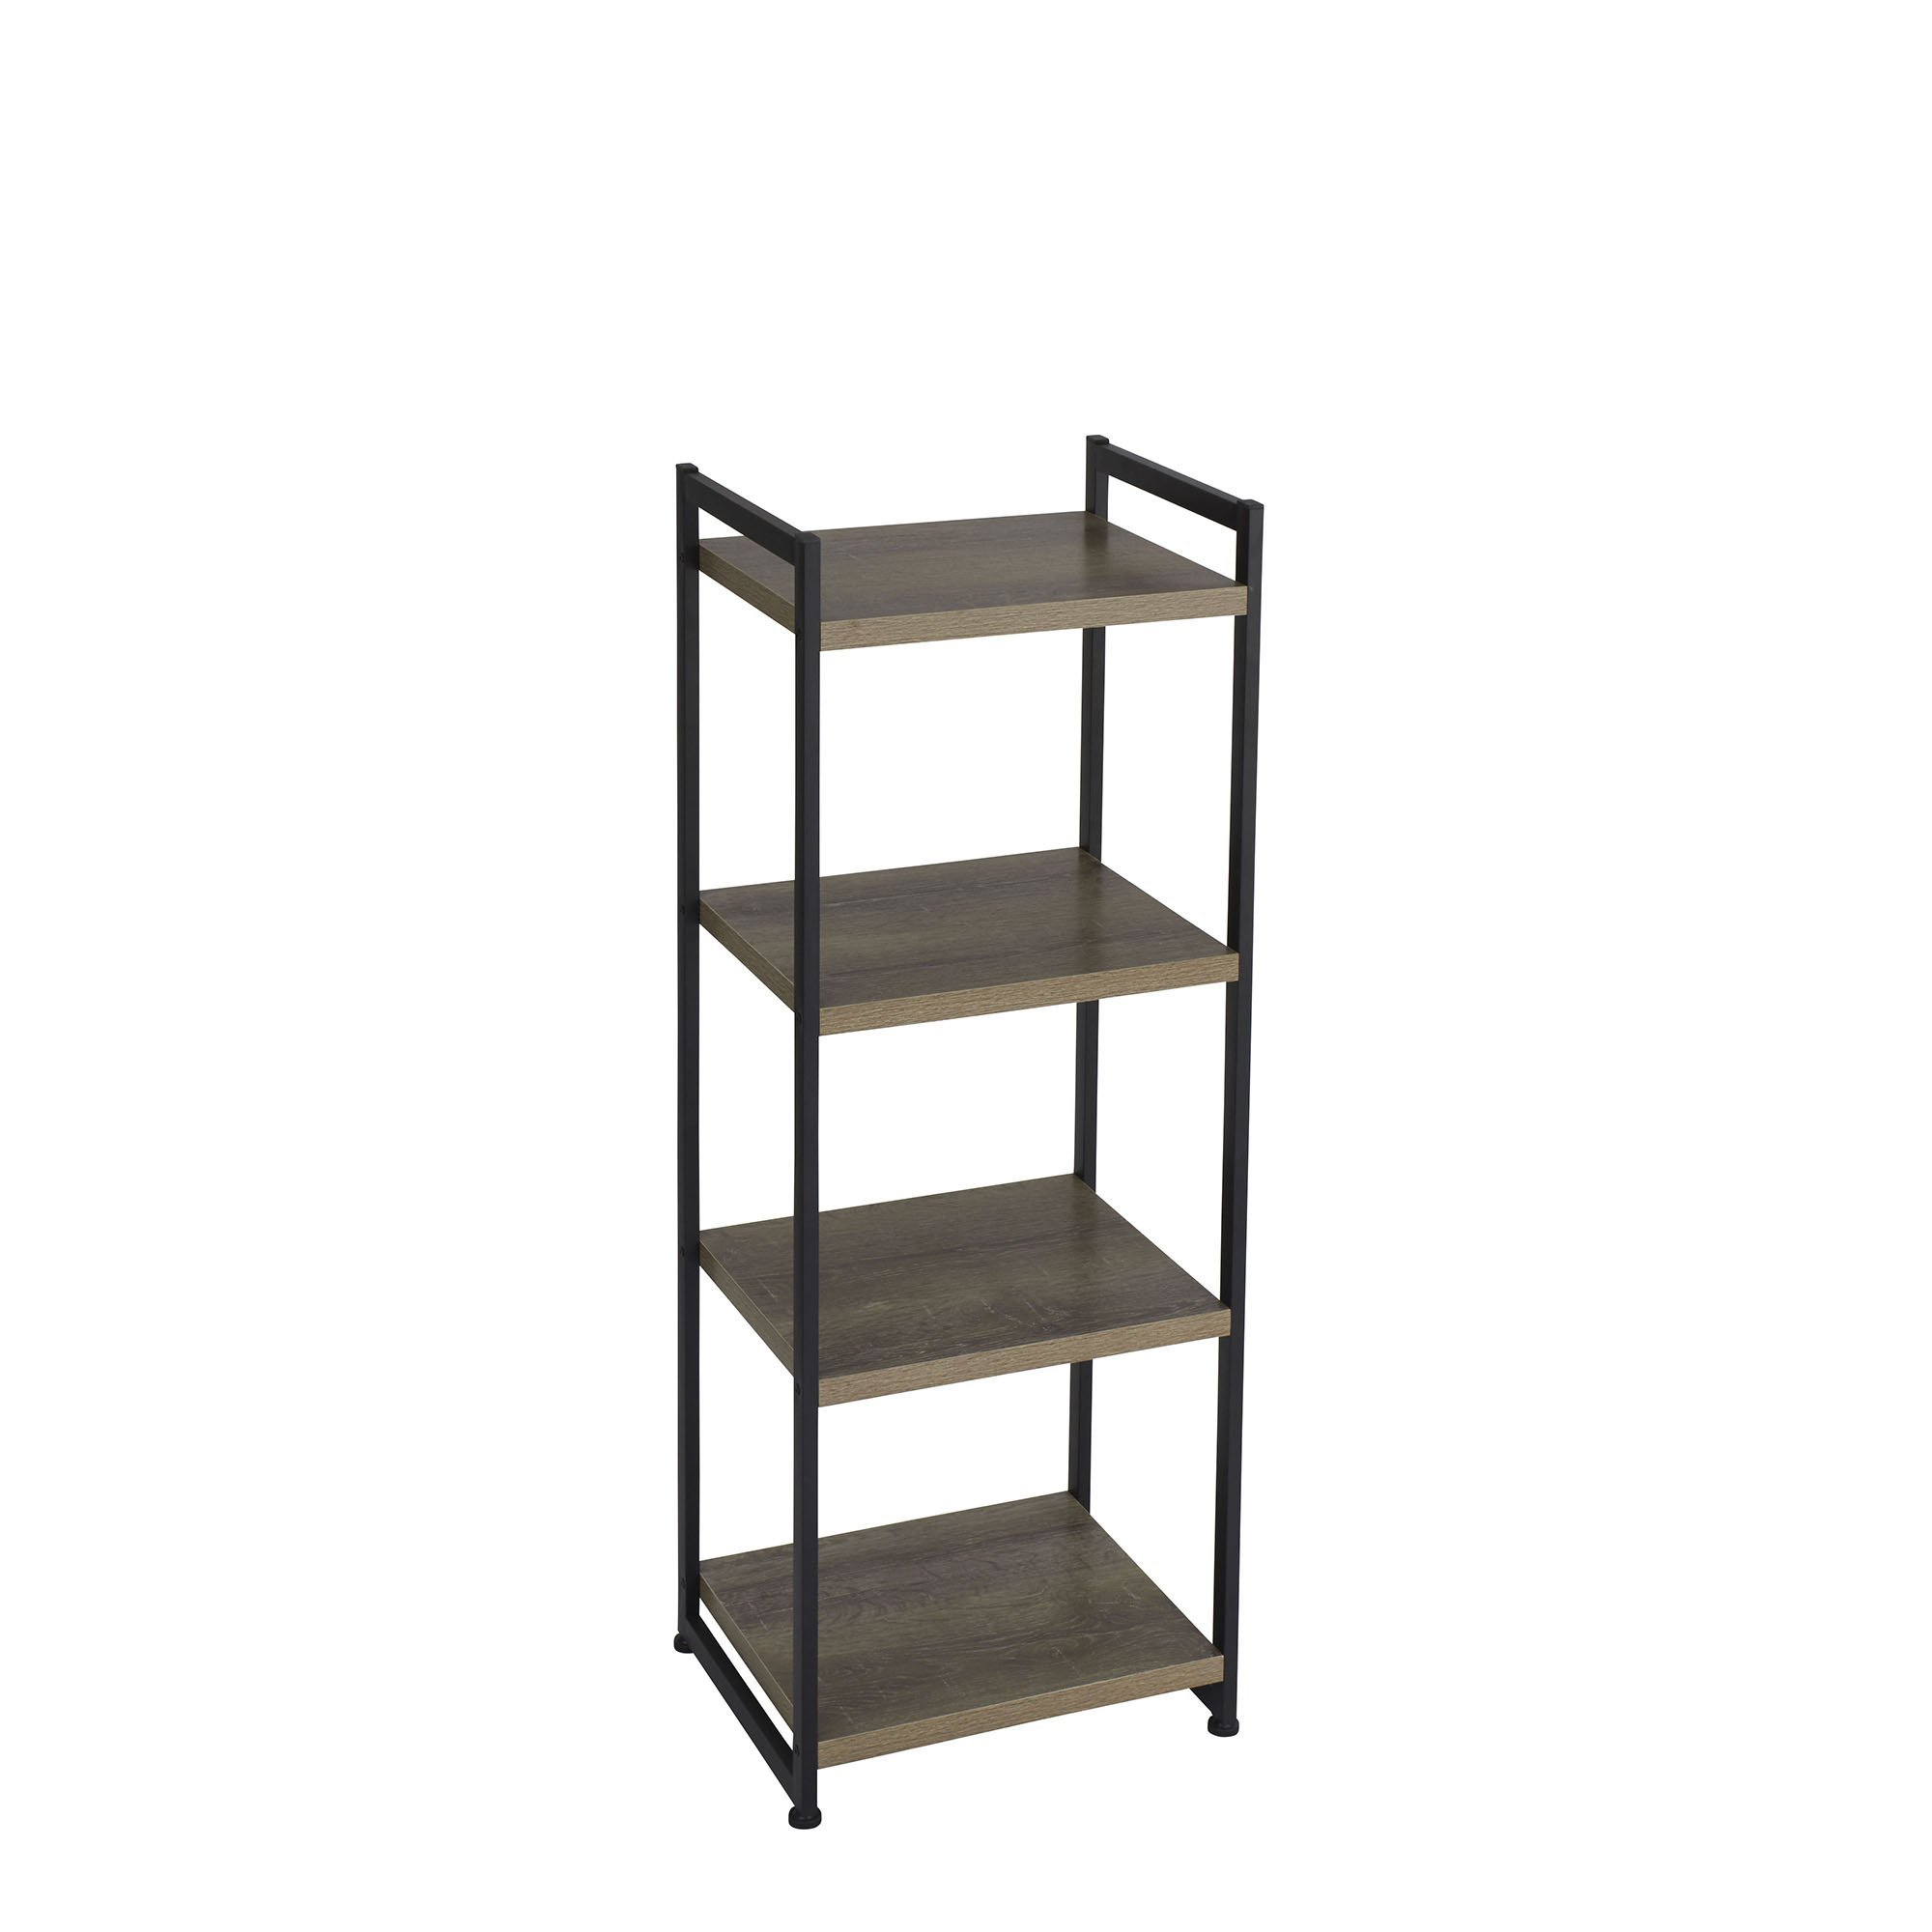 Household Essentials 4 Tier Storage Tower Shelf with Metal, Grey Shelves – Black Frame, Ashwood